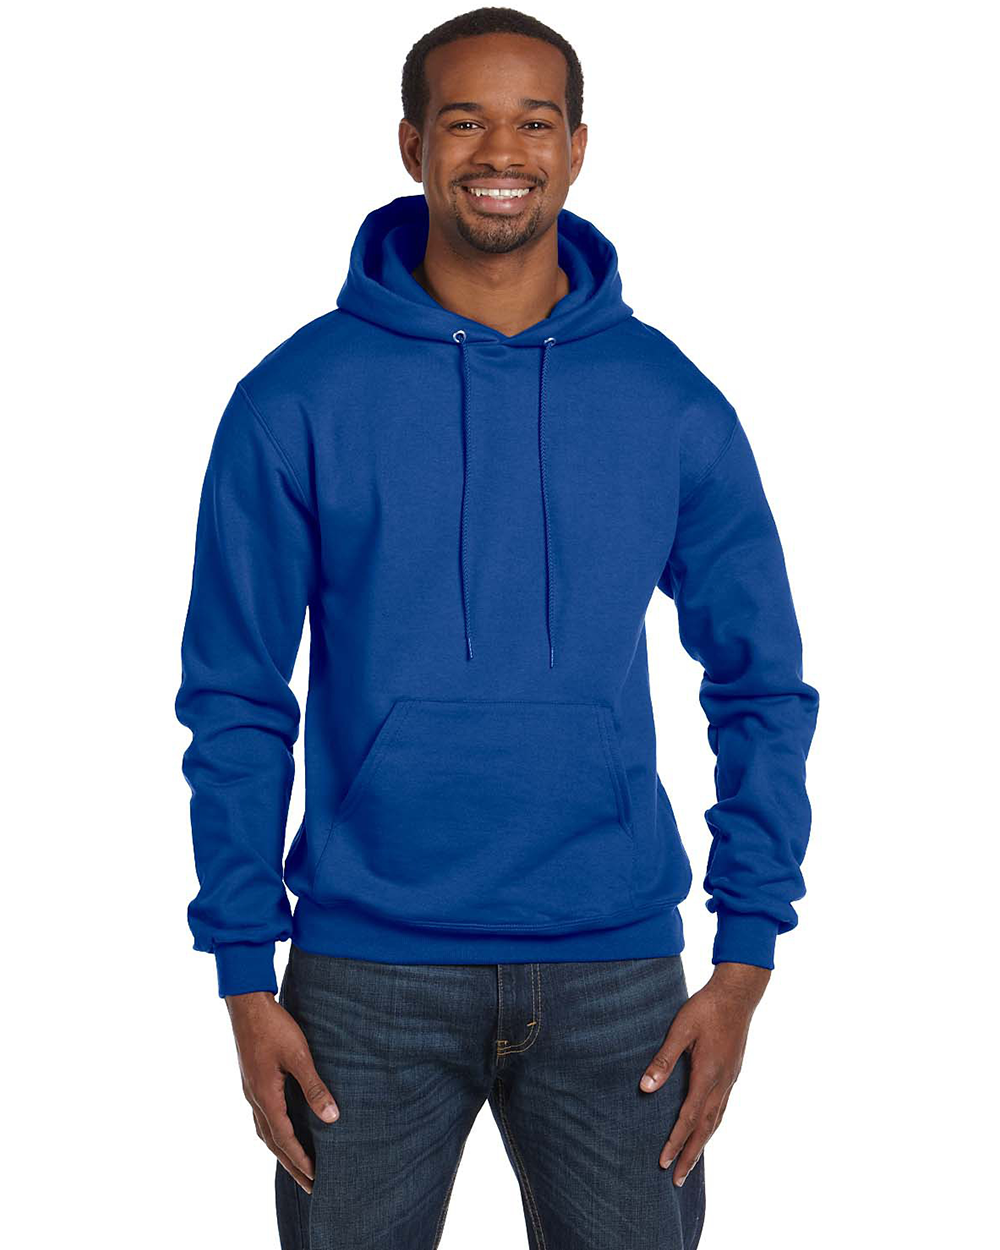 Double Dry Eco Pullover Hooded Sweatshirt